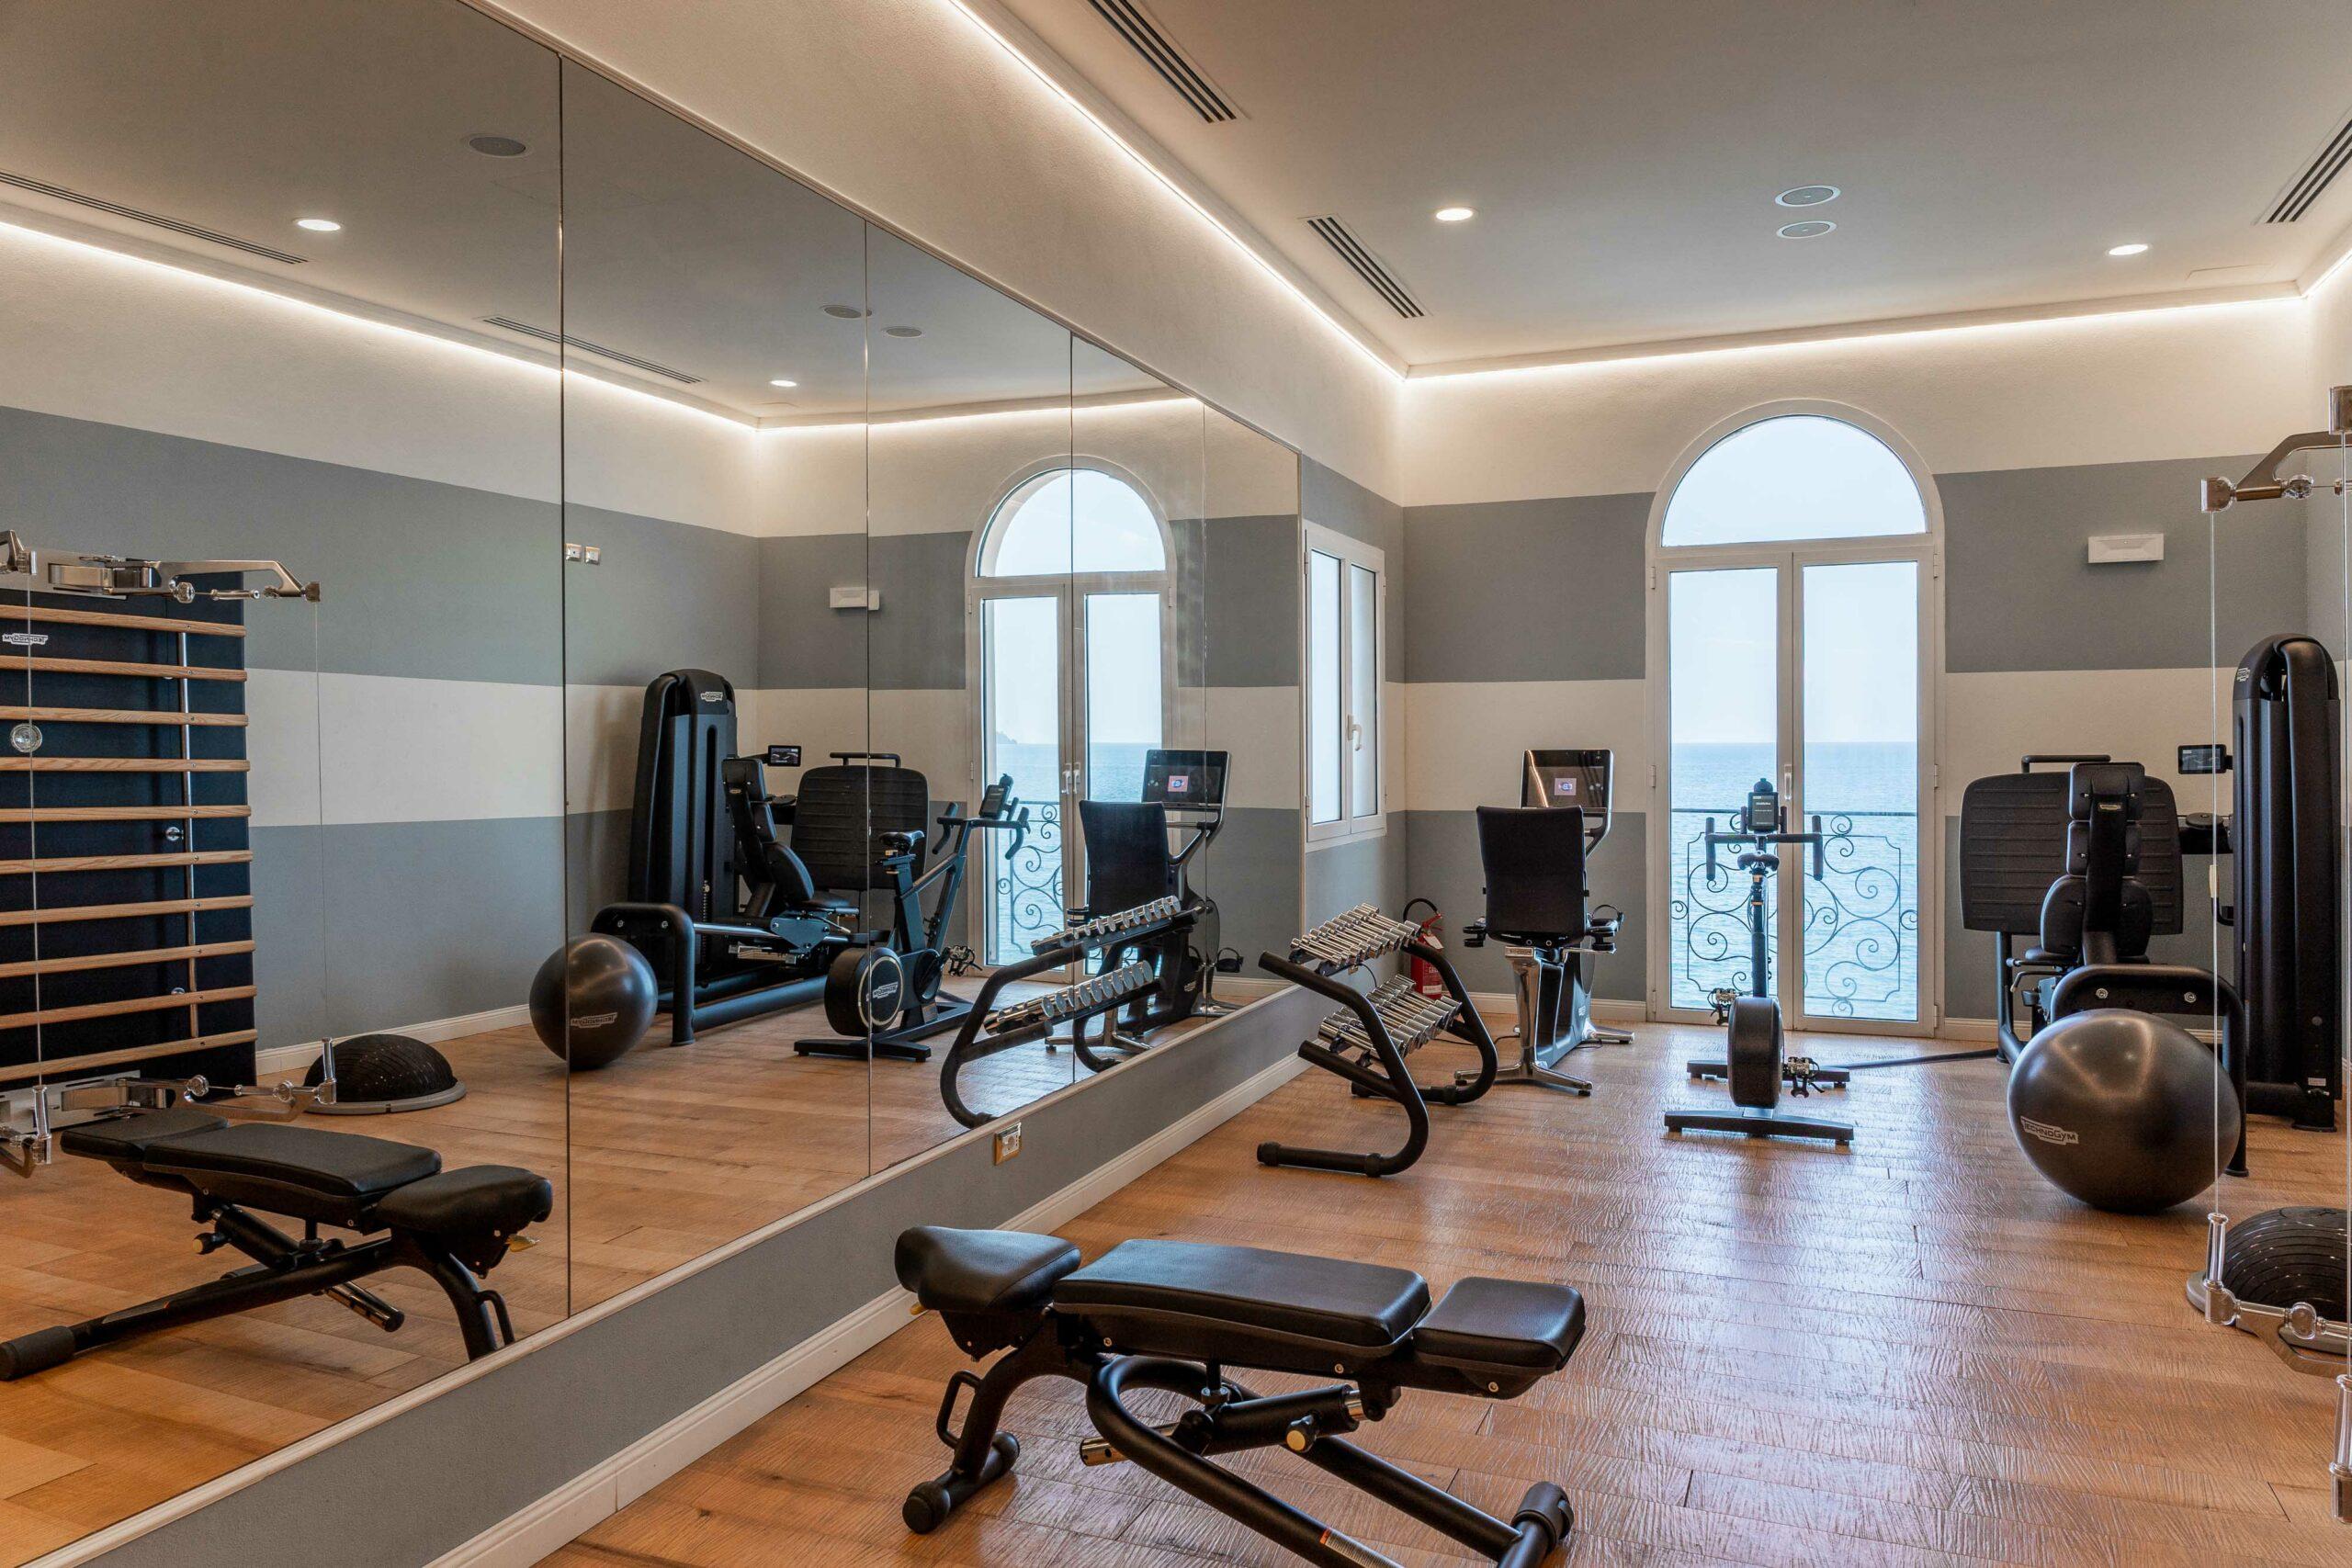 Hotel-Excelsior-Rapallo_Immodrone_Gym